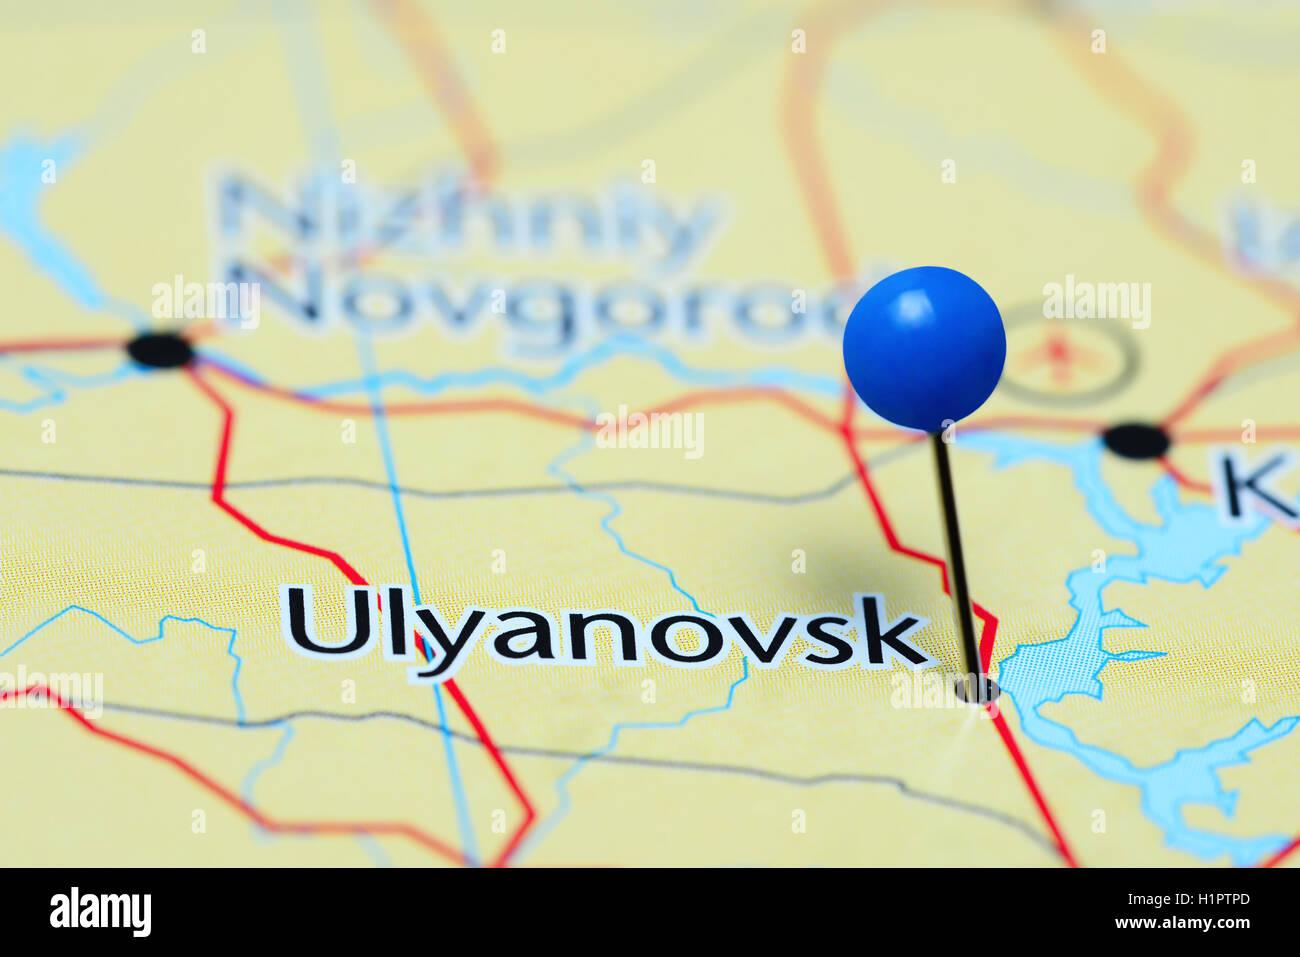 Ulyanovsk pinned on a map of Russia